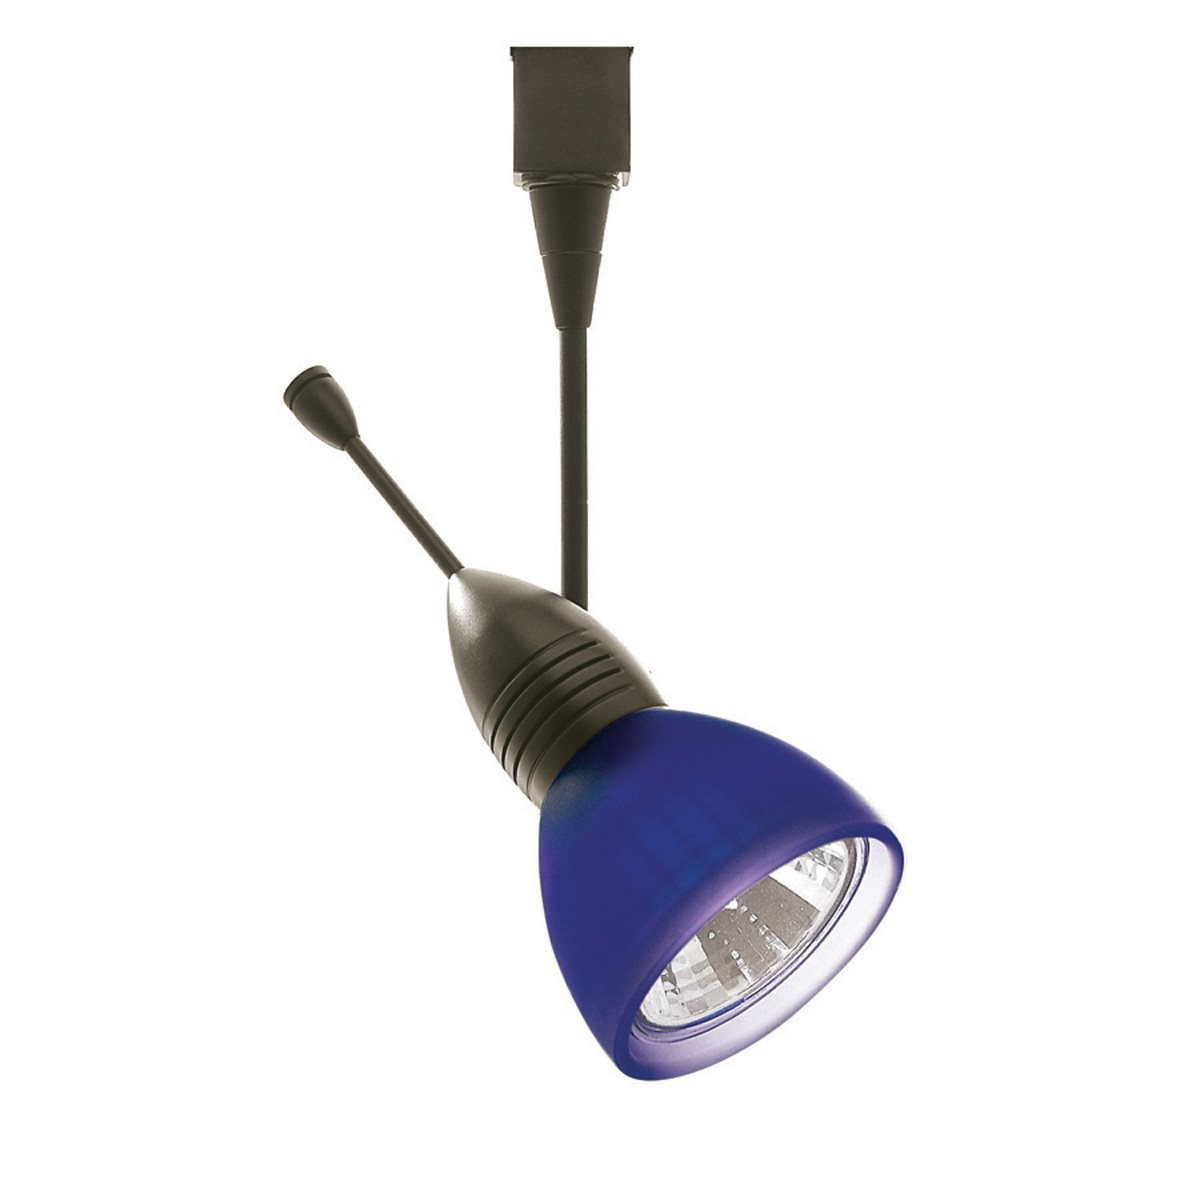 Wac lighting qf 194 ego swivel ceiling light fixture wac qf 194 x3 3 length db dark bronze finish arubaitofo Image collections